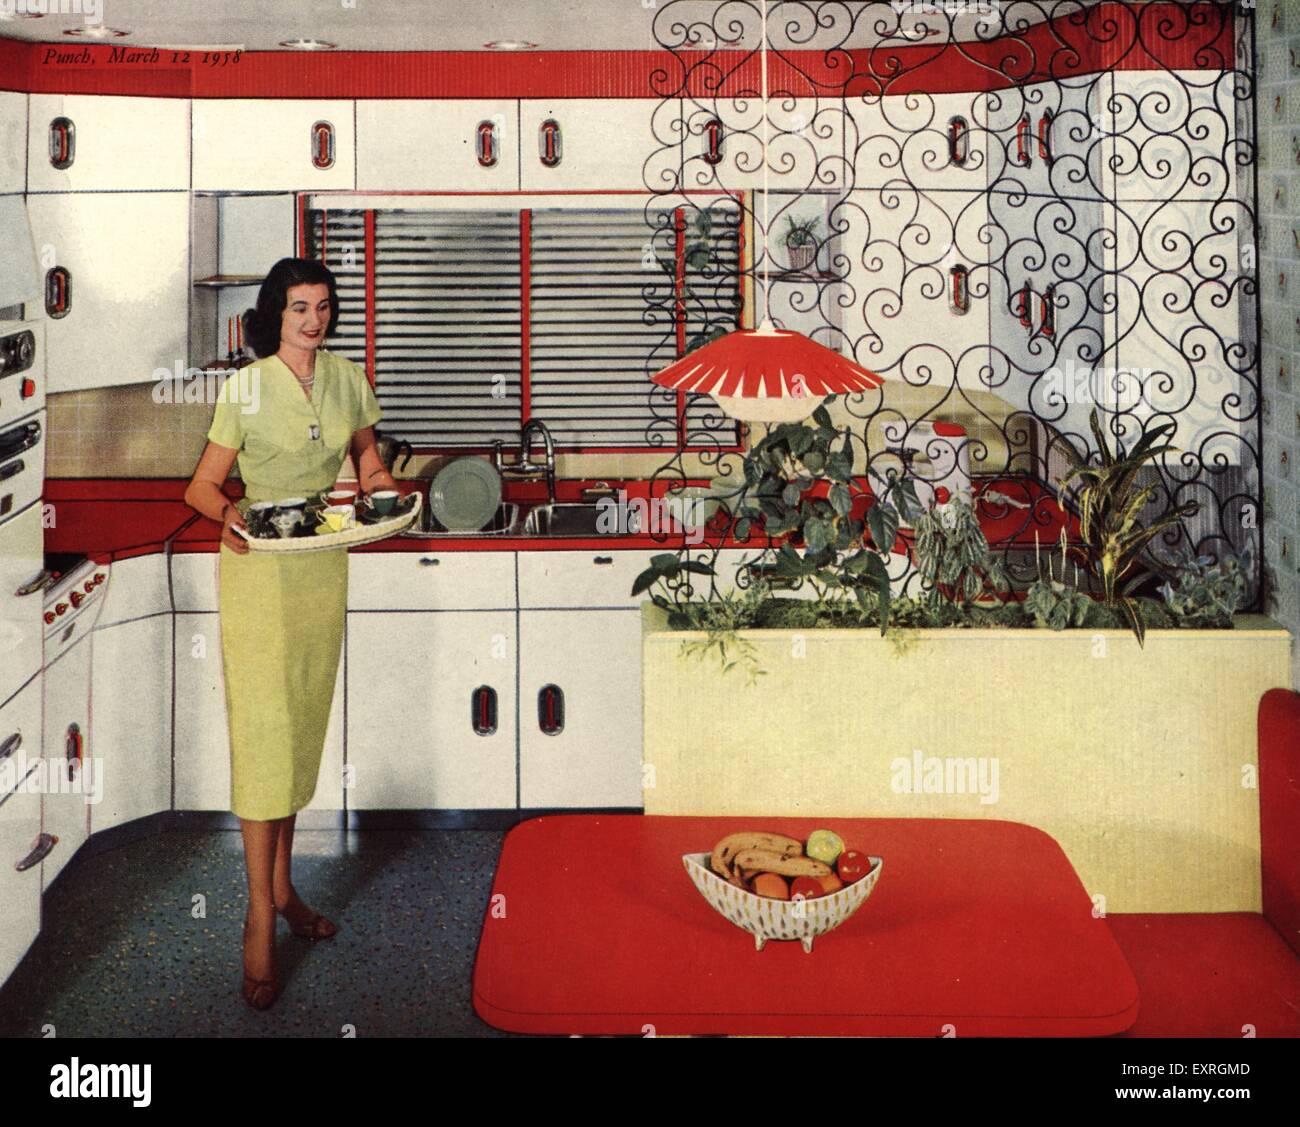 1950s UK Kitchens Magazine Advert (detail)